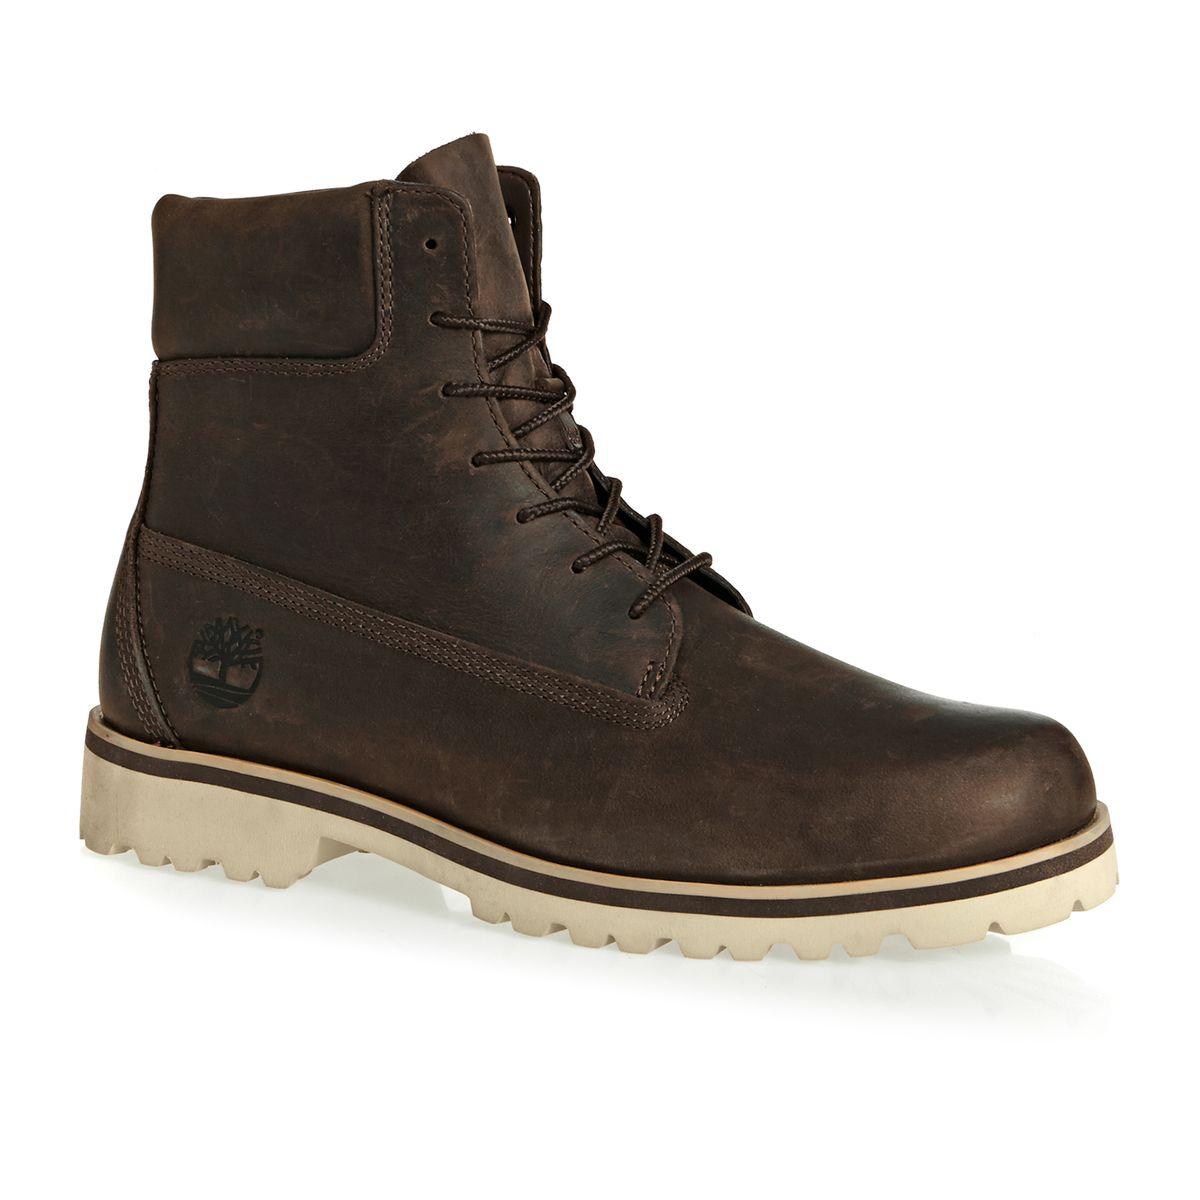 Saddleback All Sizes Timberland Chilmark 6 Boot Potting Soil Mens Boots